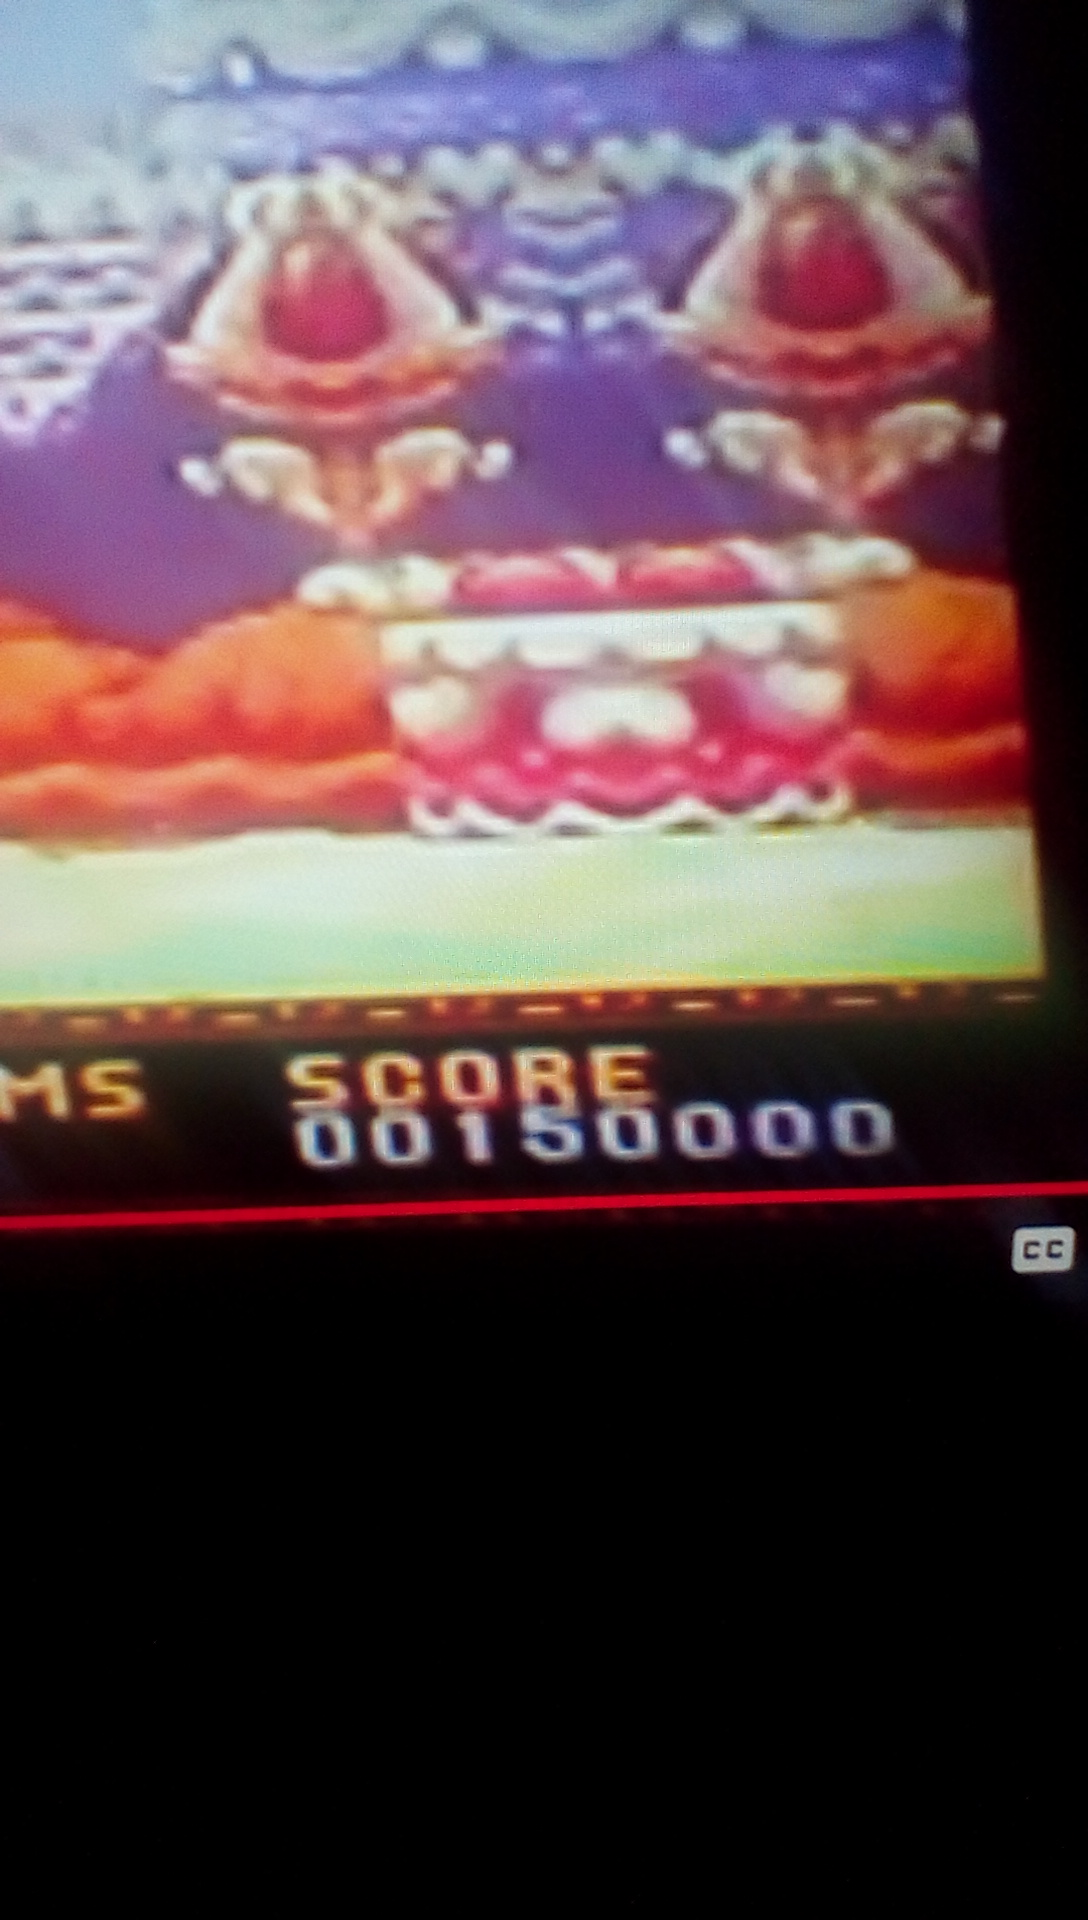 DrJoshDaRealGamer30: Castle Of Illusion: Starring Mickey Mouse [Normal] (Sega Genesis / MegaDrive) 150,000 points on 2019-12-22 17:04:10